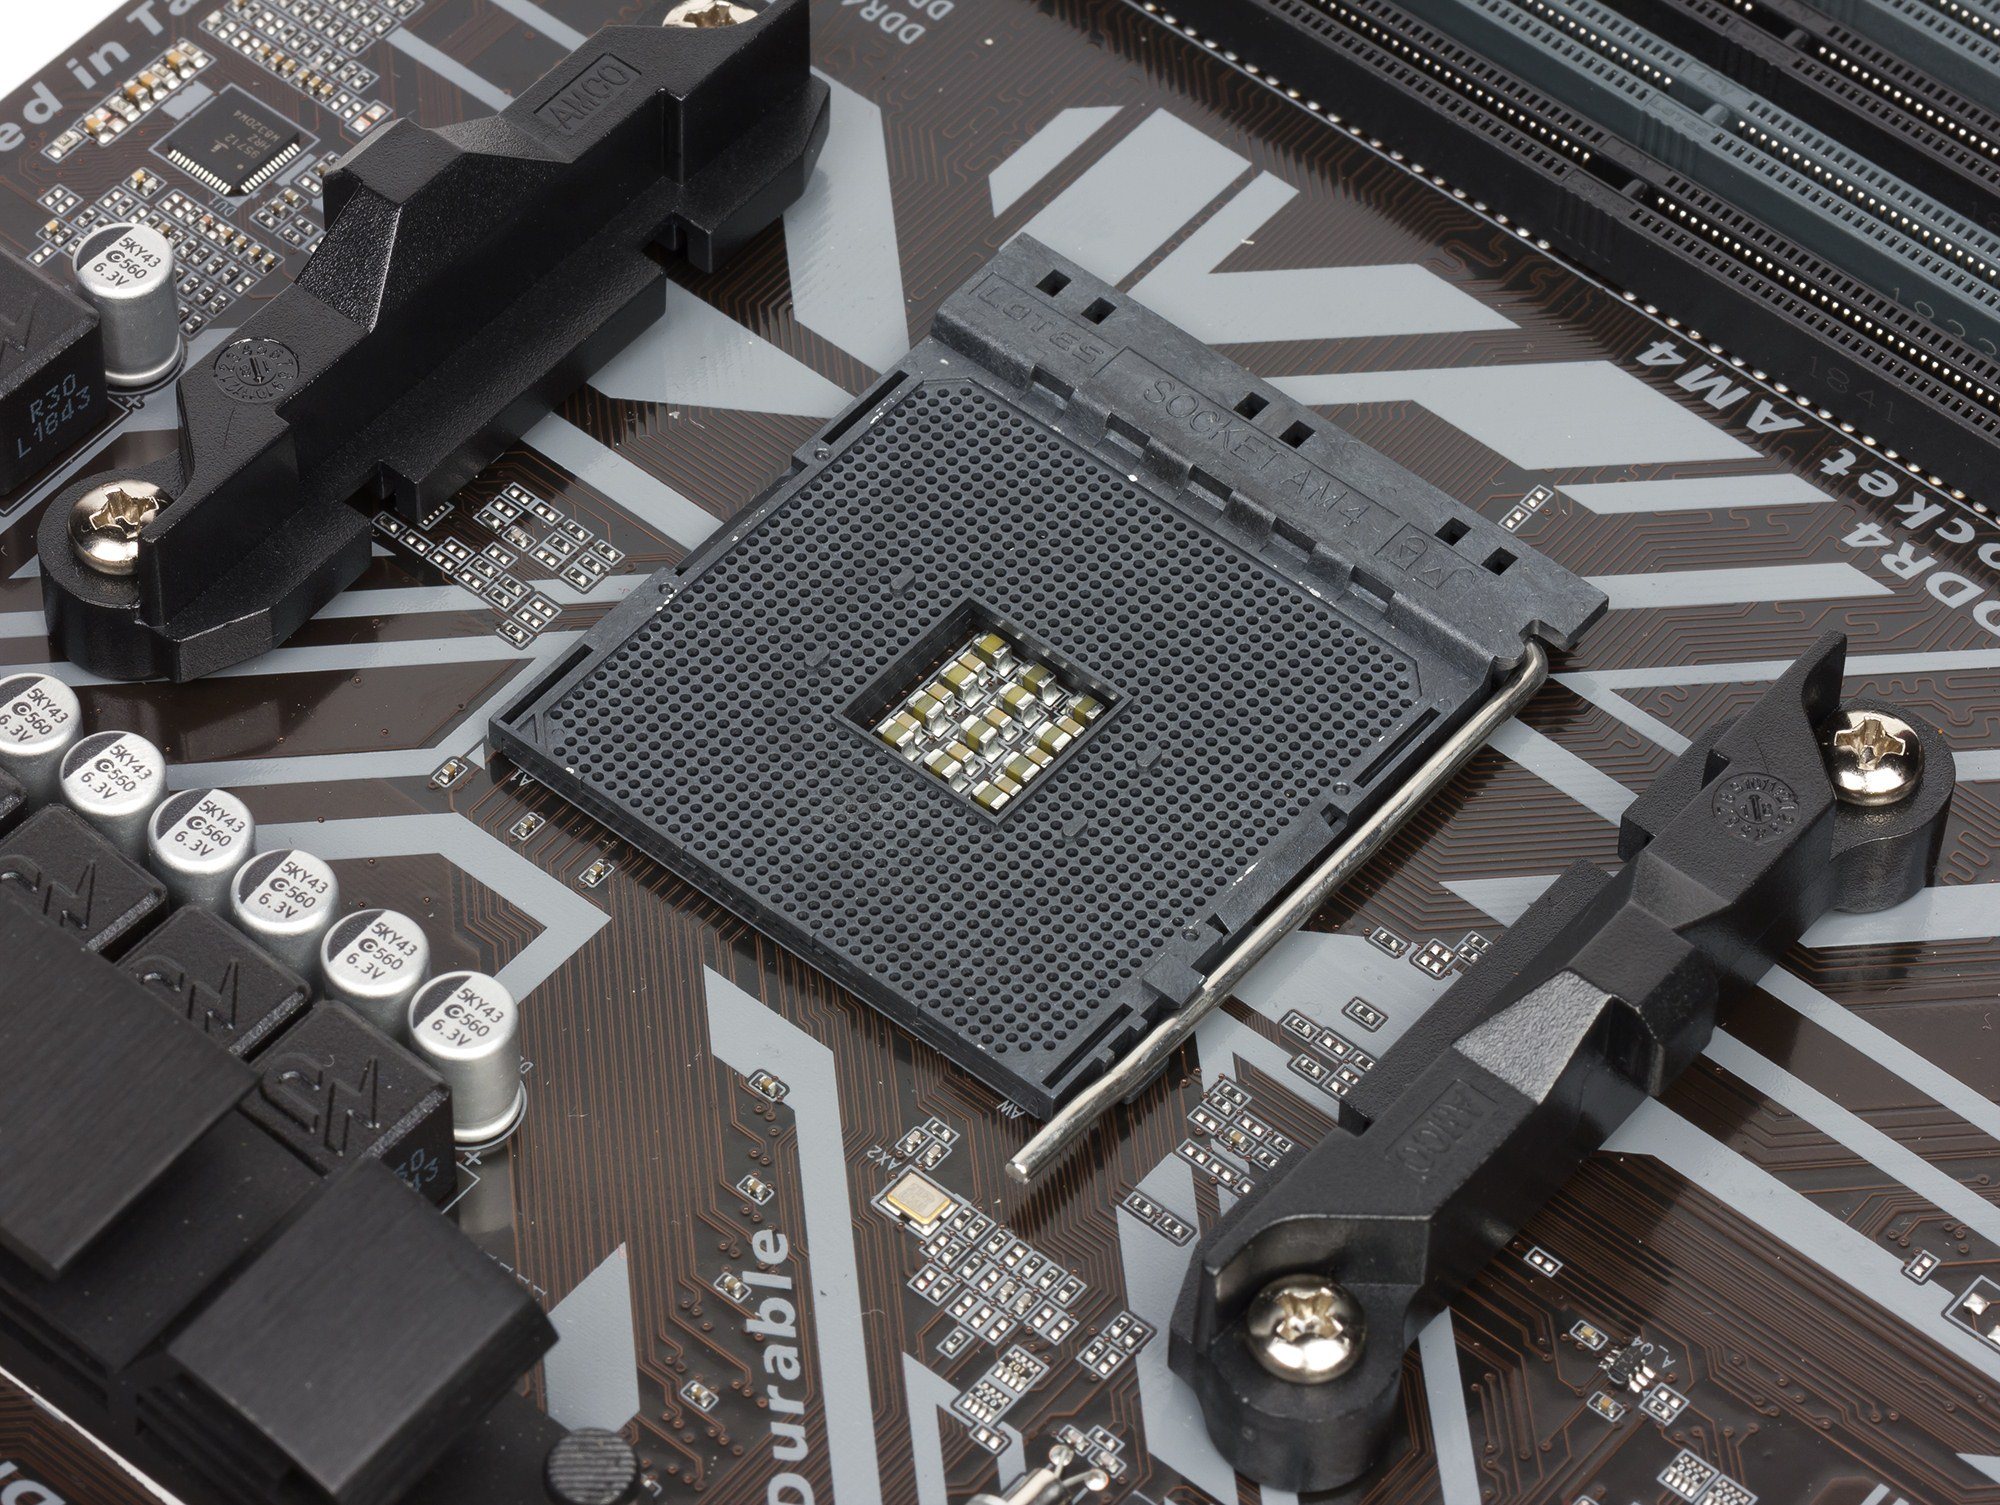 Обзор материнской платы Gigabyte B450M DS3H на чипсете AMD B450